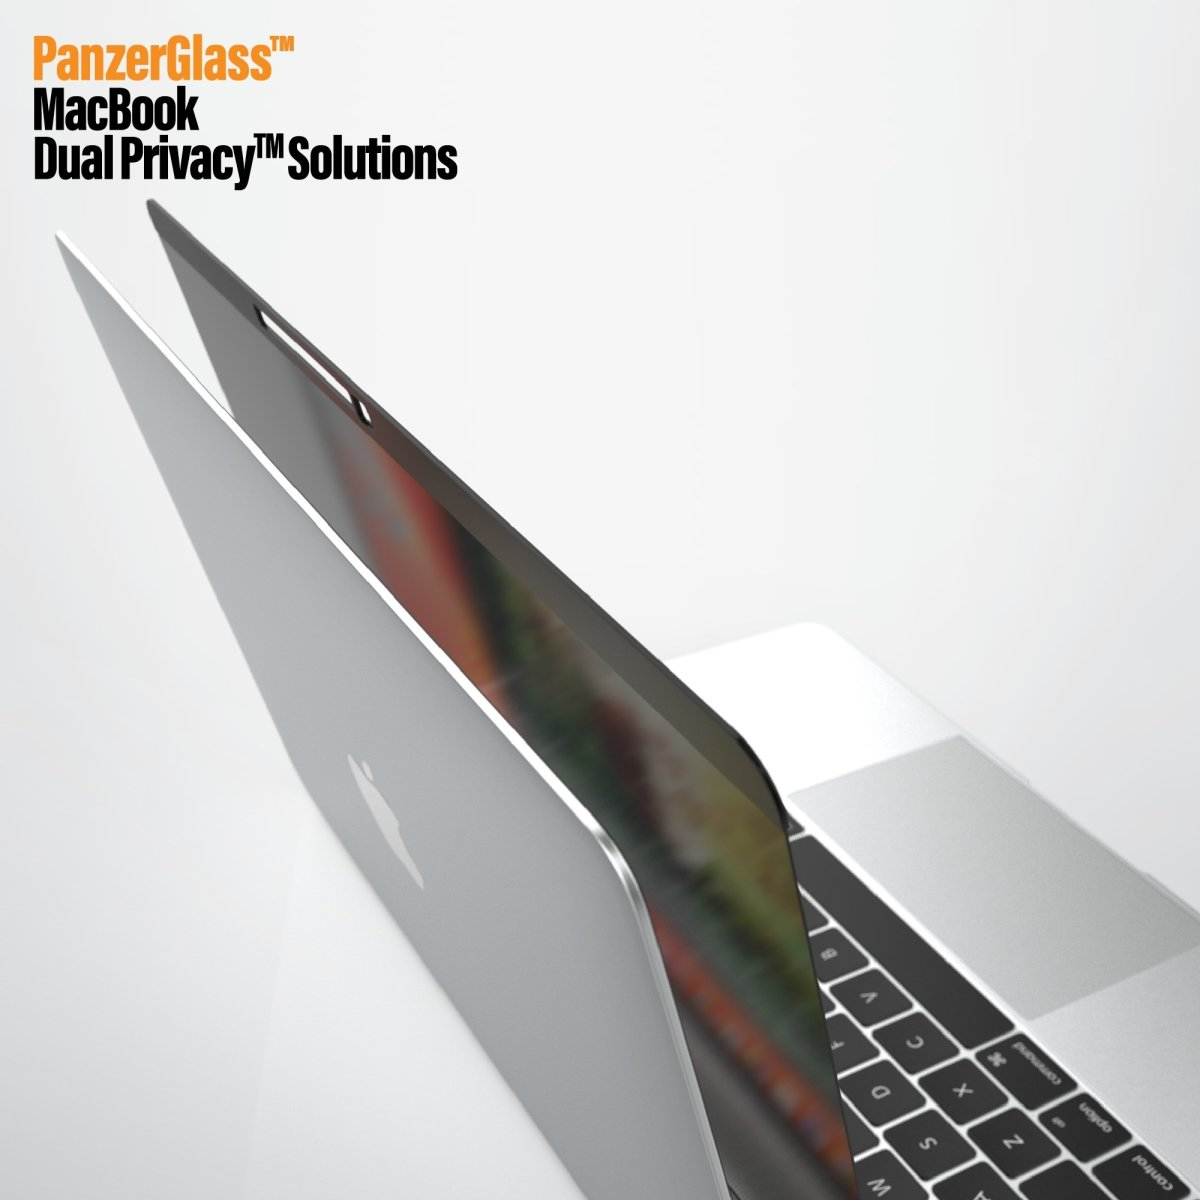 PanzerGlass Magnetisk Privacy til 12'' MacBook